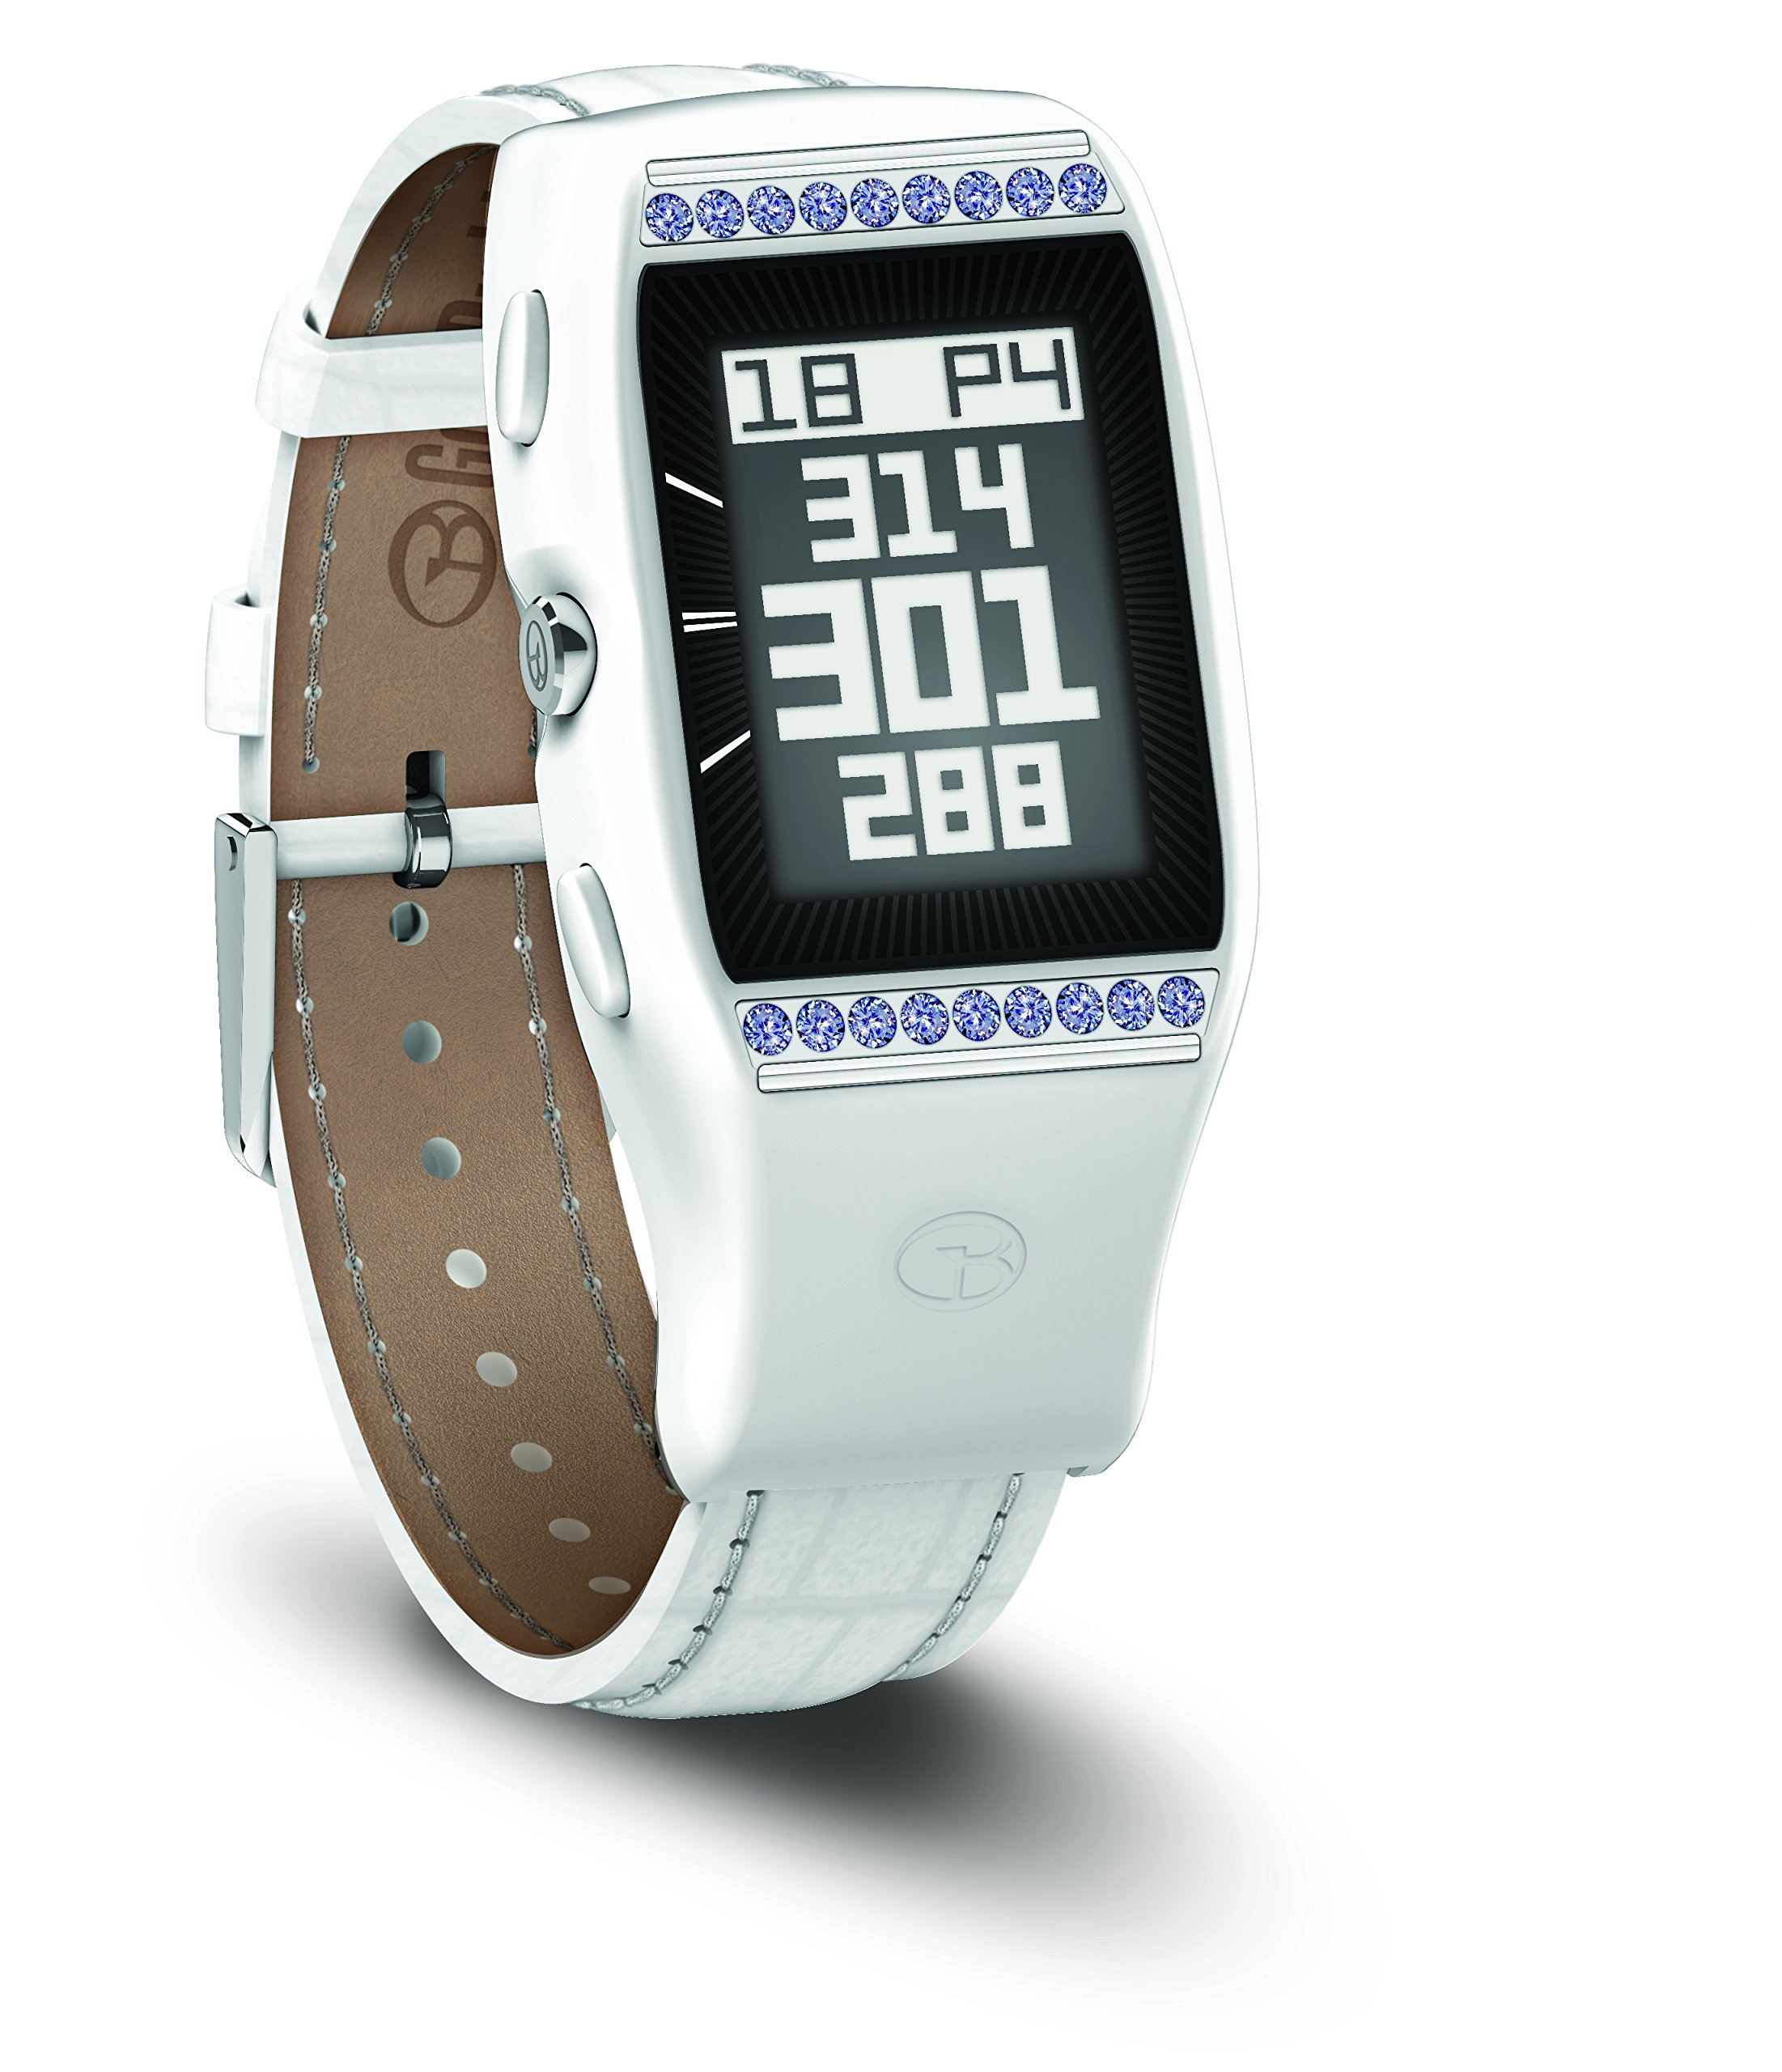 GolfBuddy Women's LD2 Golf GPS Watch with Swarovski Crystals, Small, White by GolfBuddy